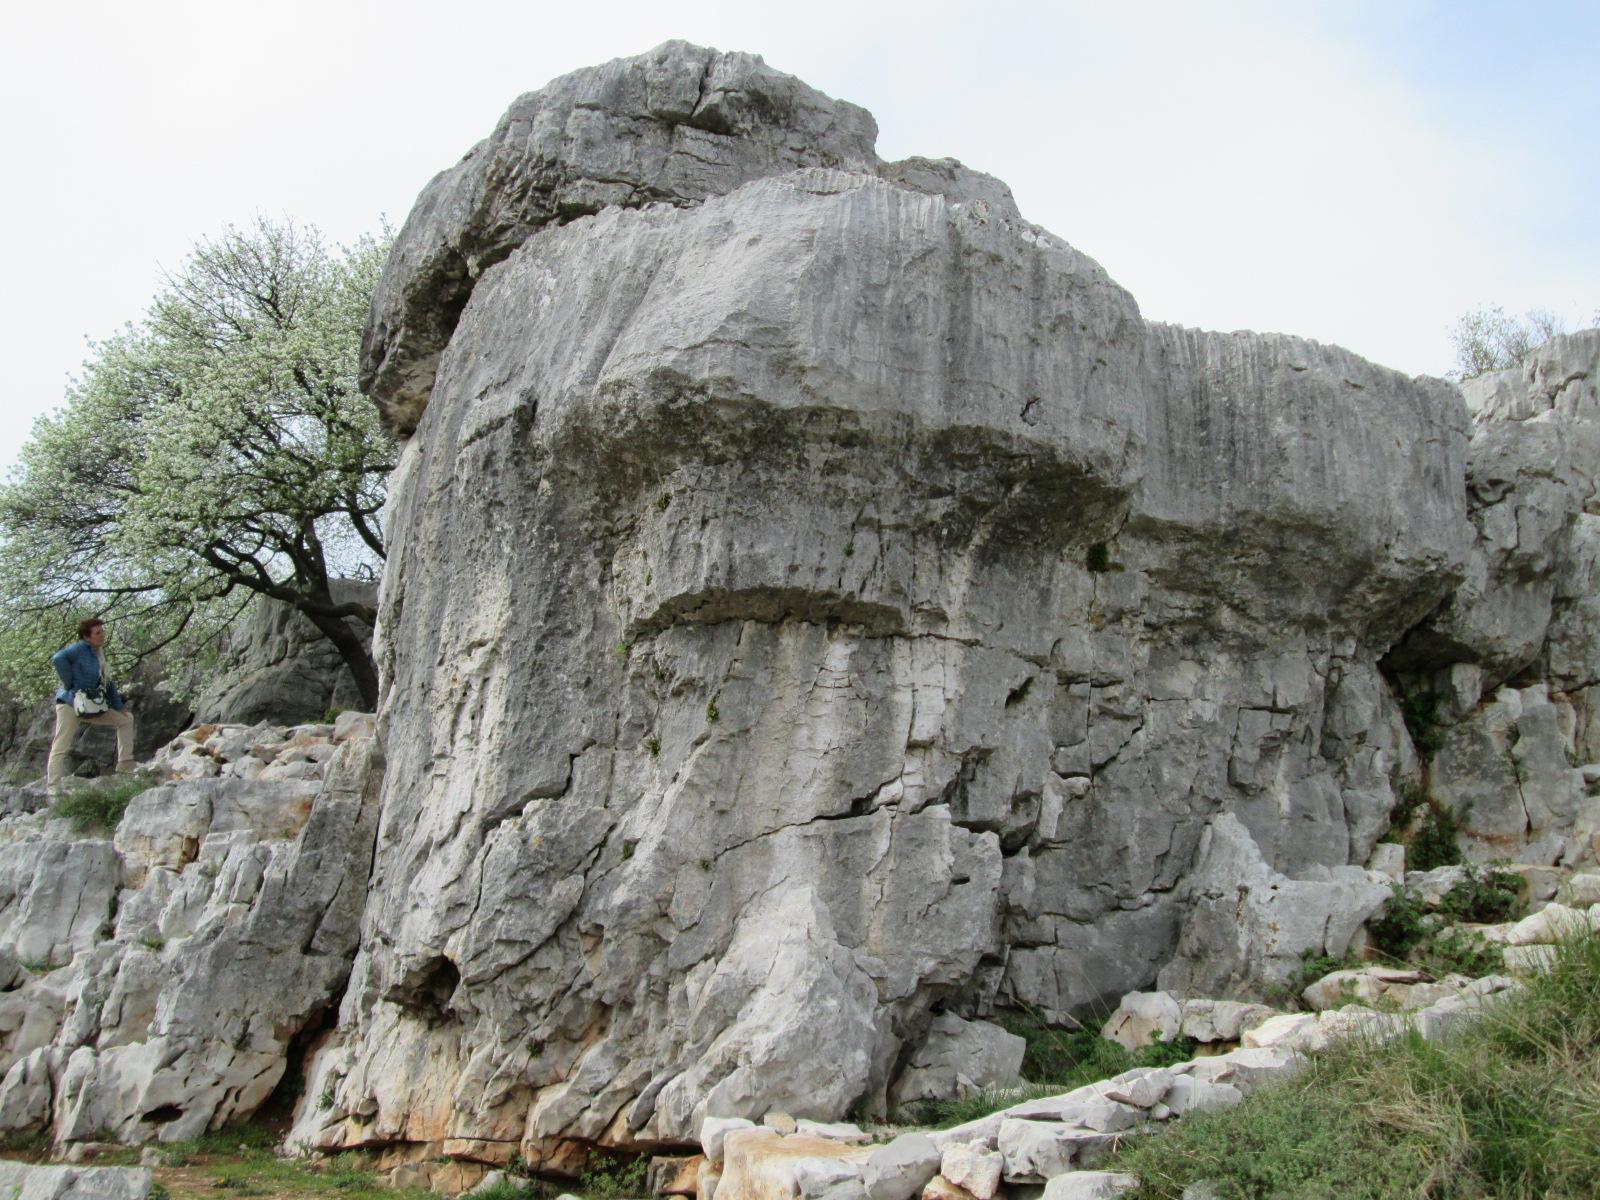 Sas De San Belin analisi geobiologica 0813